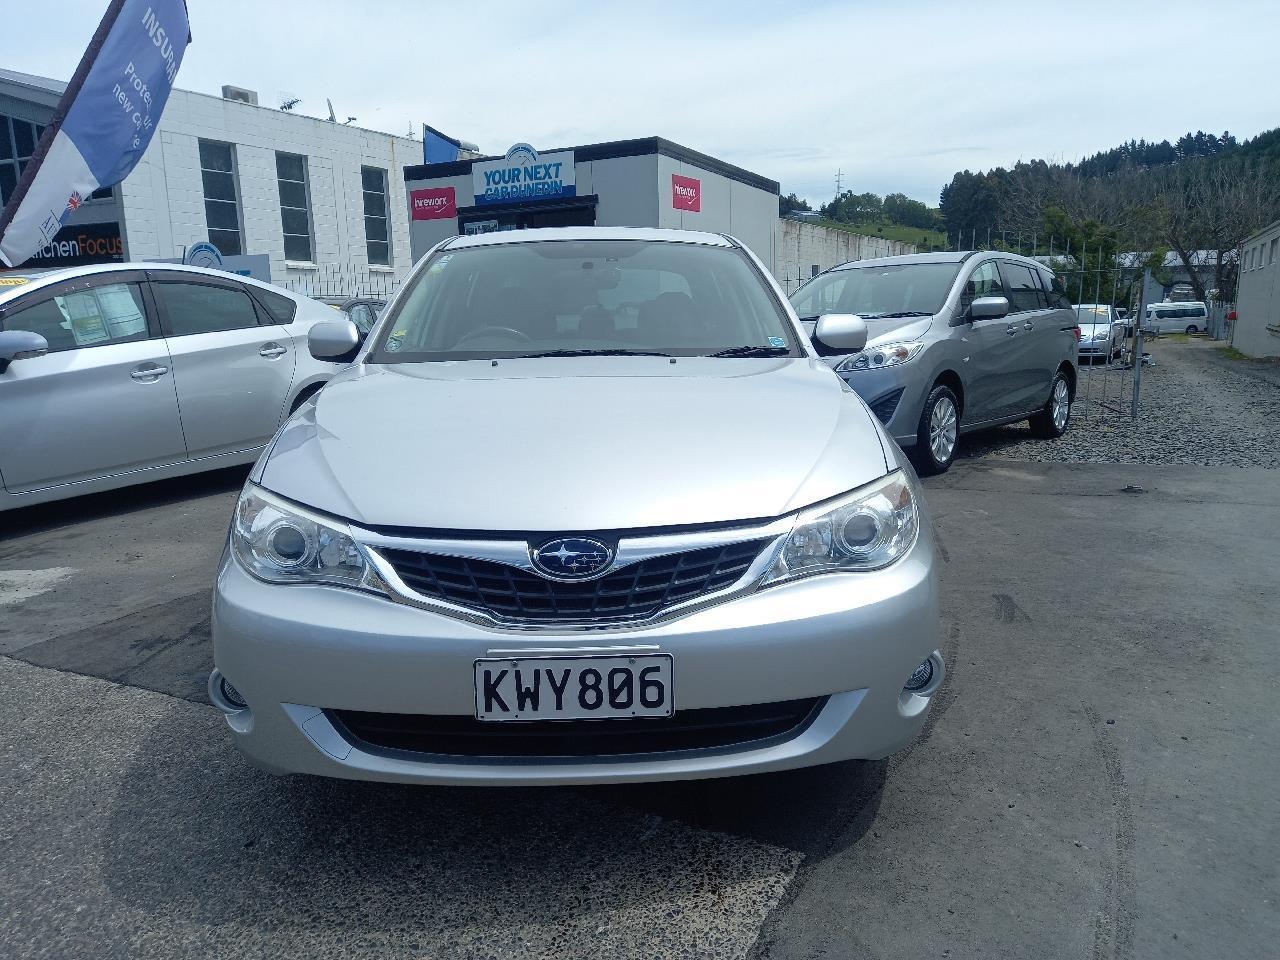 image-2, 2012 Subaru Impreza AWD No Deposit Finance at Dunedin